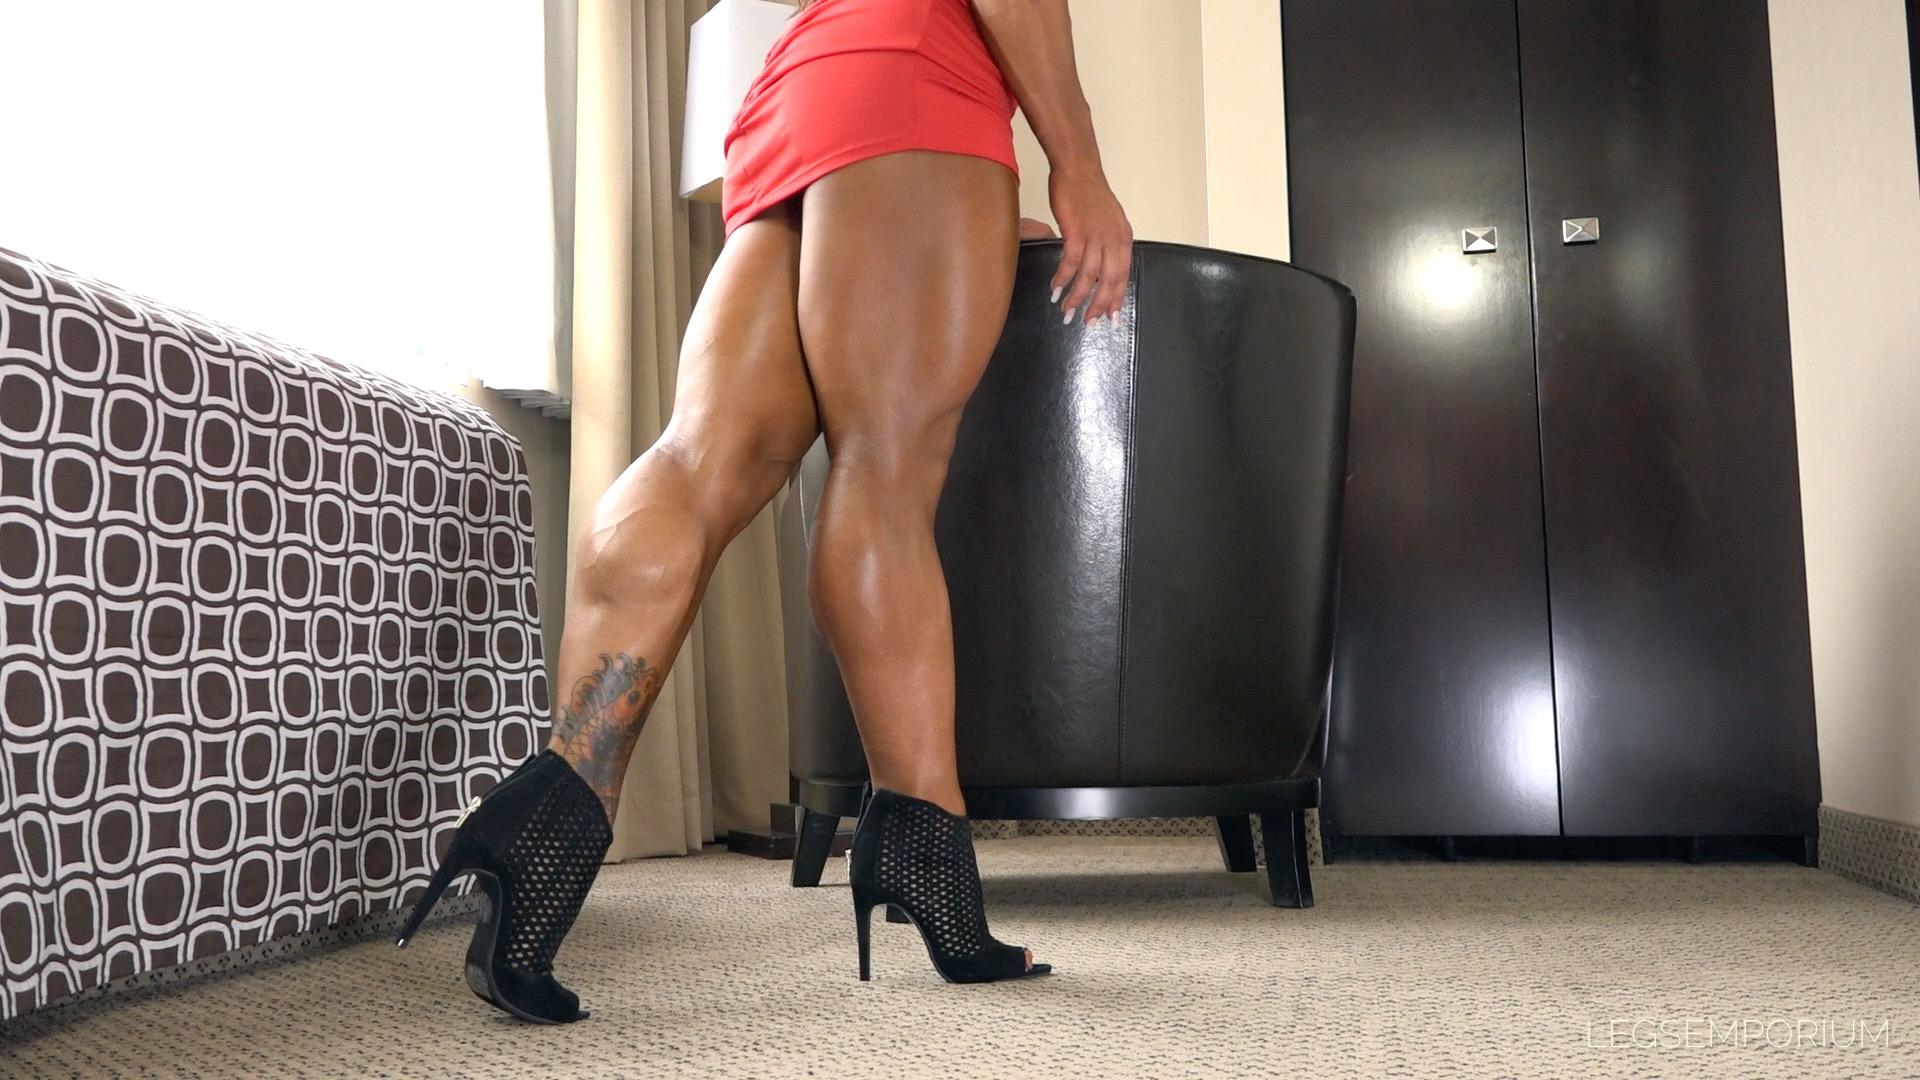 Akane Nigro - Muscular Legs Movements Of Dreams 1  Legs -9867